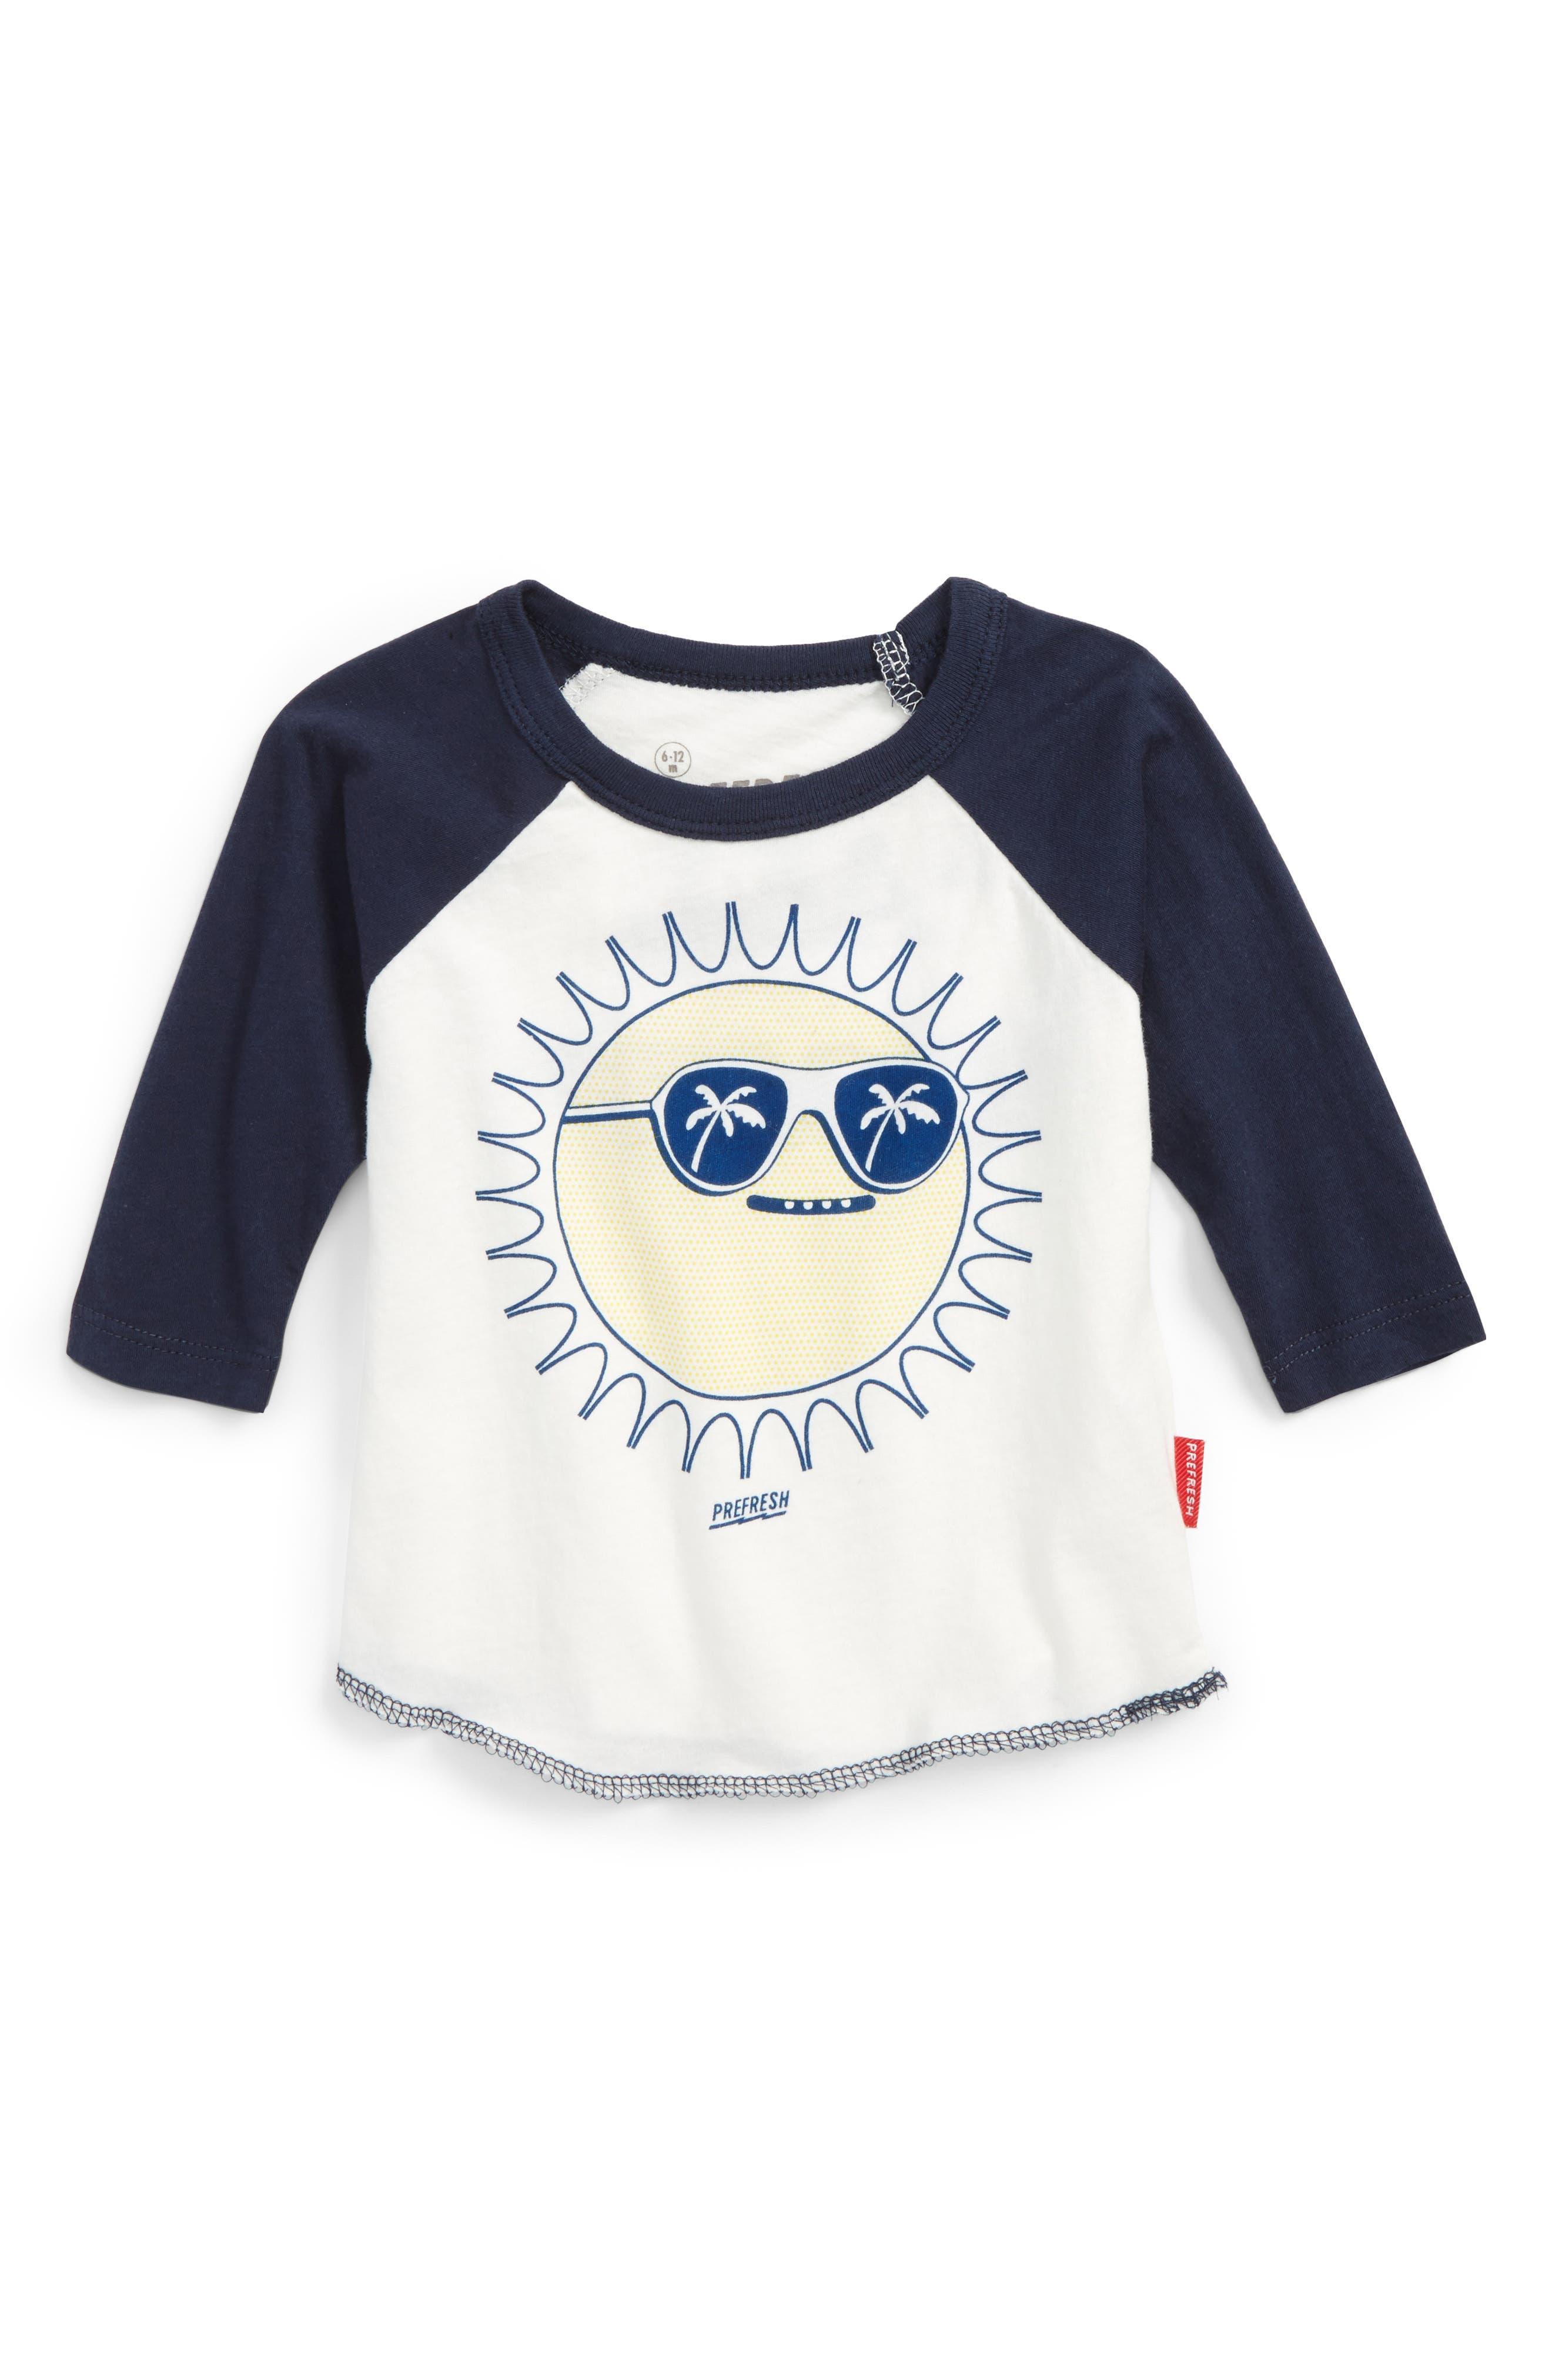 Alternate Image 1 Selected - Prefresh Sunny Baseball Raglan T-Shirt (Baby Boys)